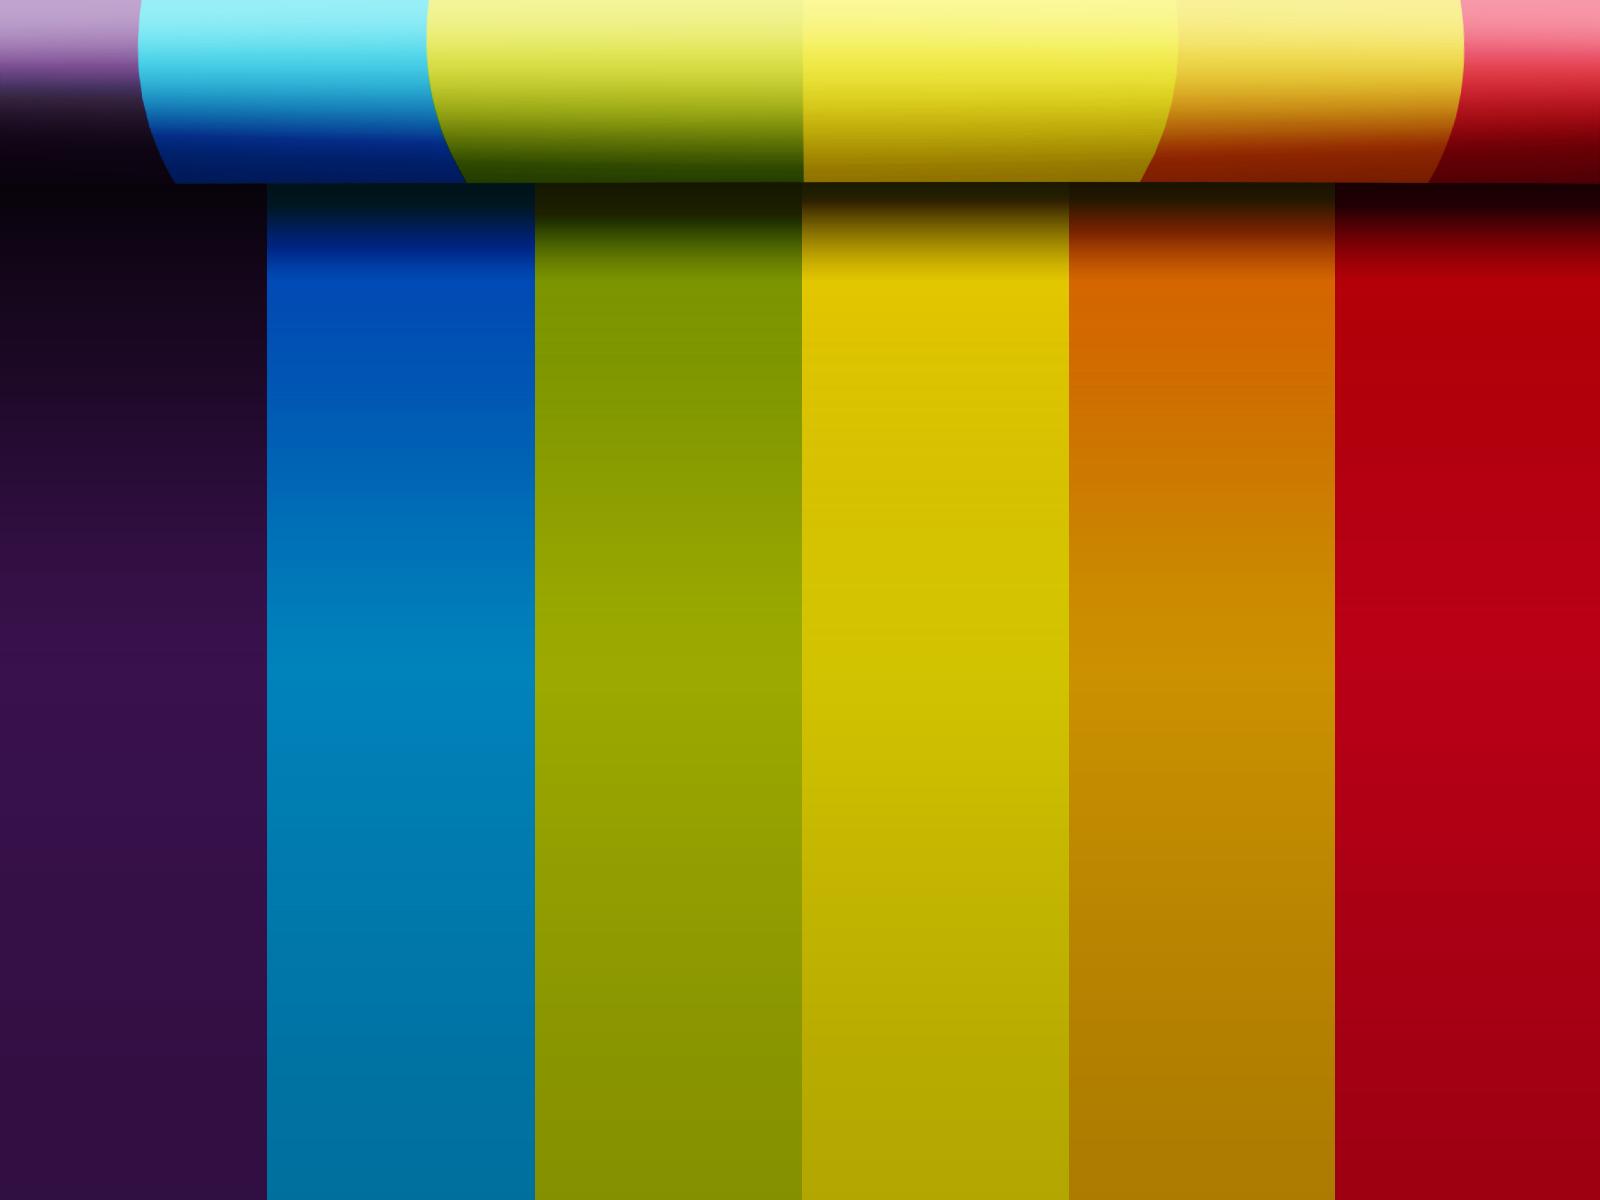 free rainbow wallpaper wallpup com